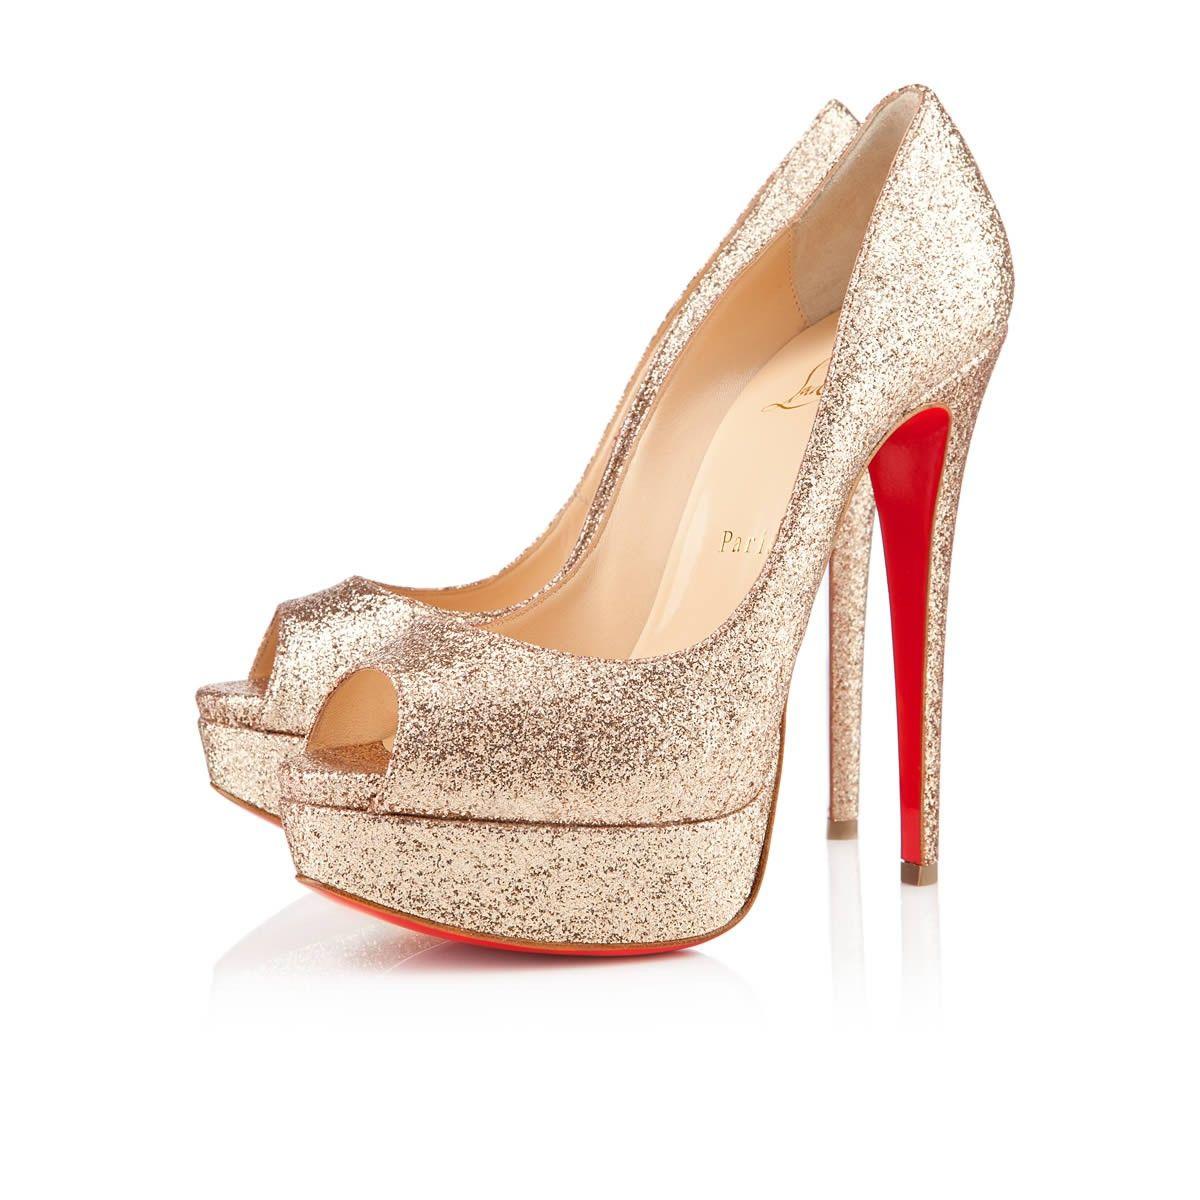 75dff43e9a0e Christian Louboutin lady peep 150mm nude glitter  945.00. Lady peep White Wedding  Shoes ...